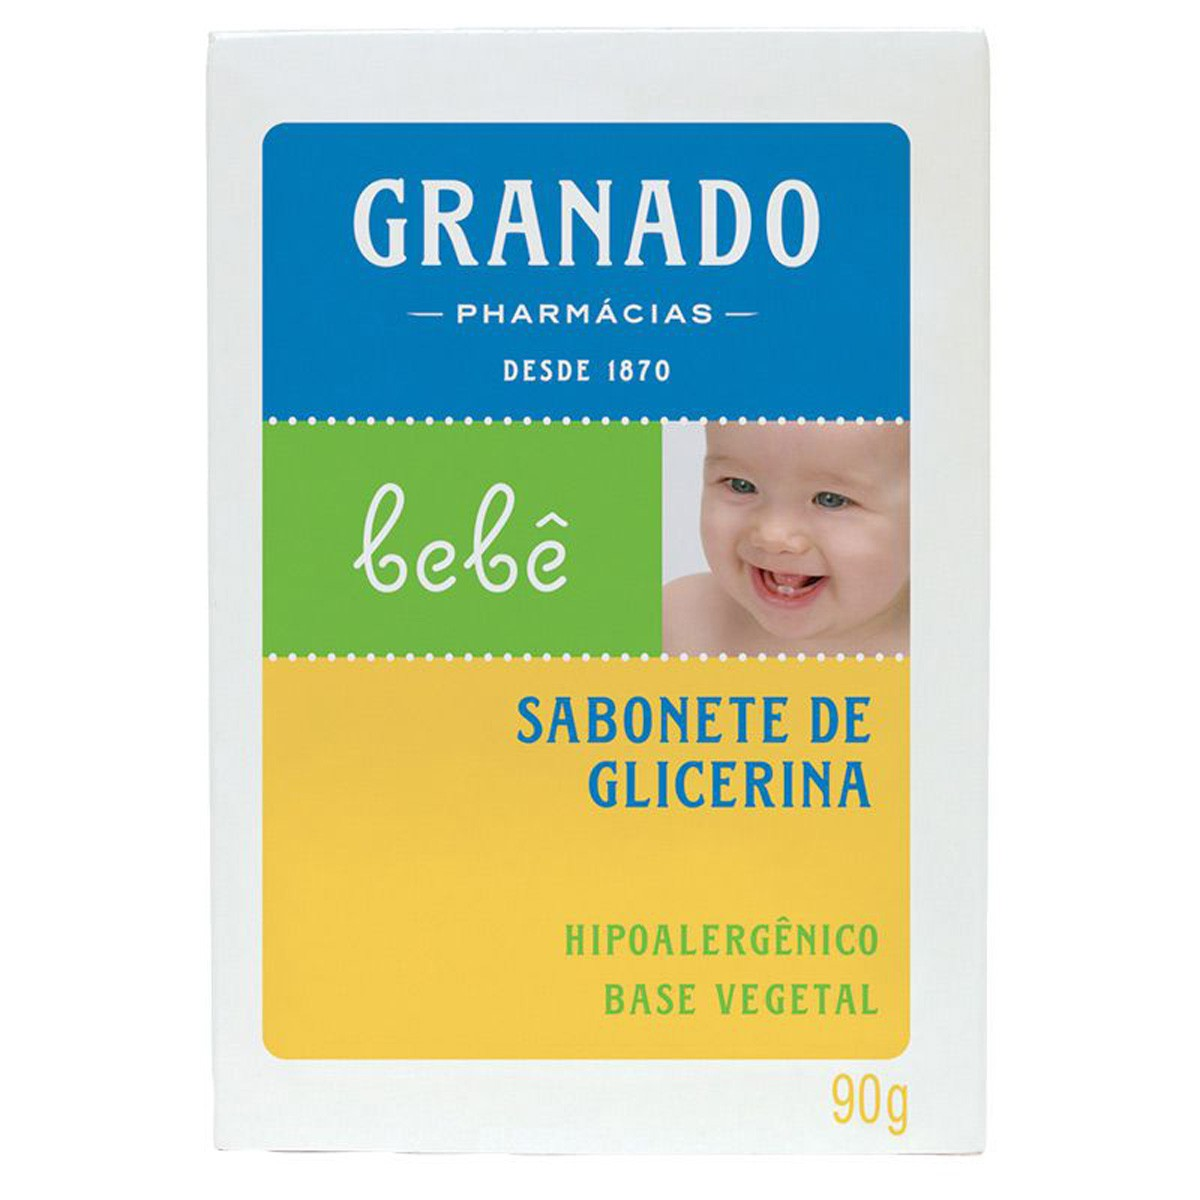 Sabonete de Glicerina Bebê Granado 90 g